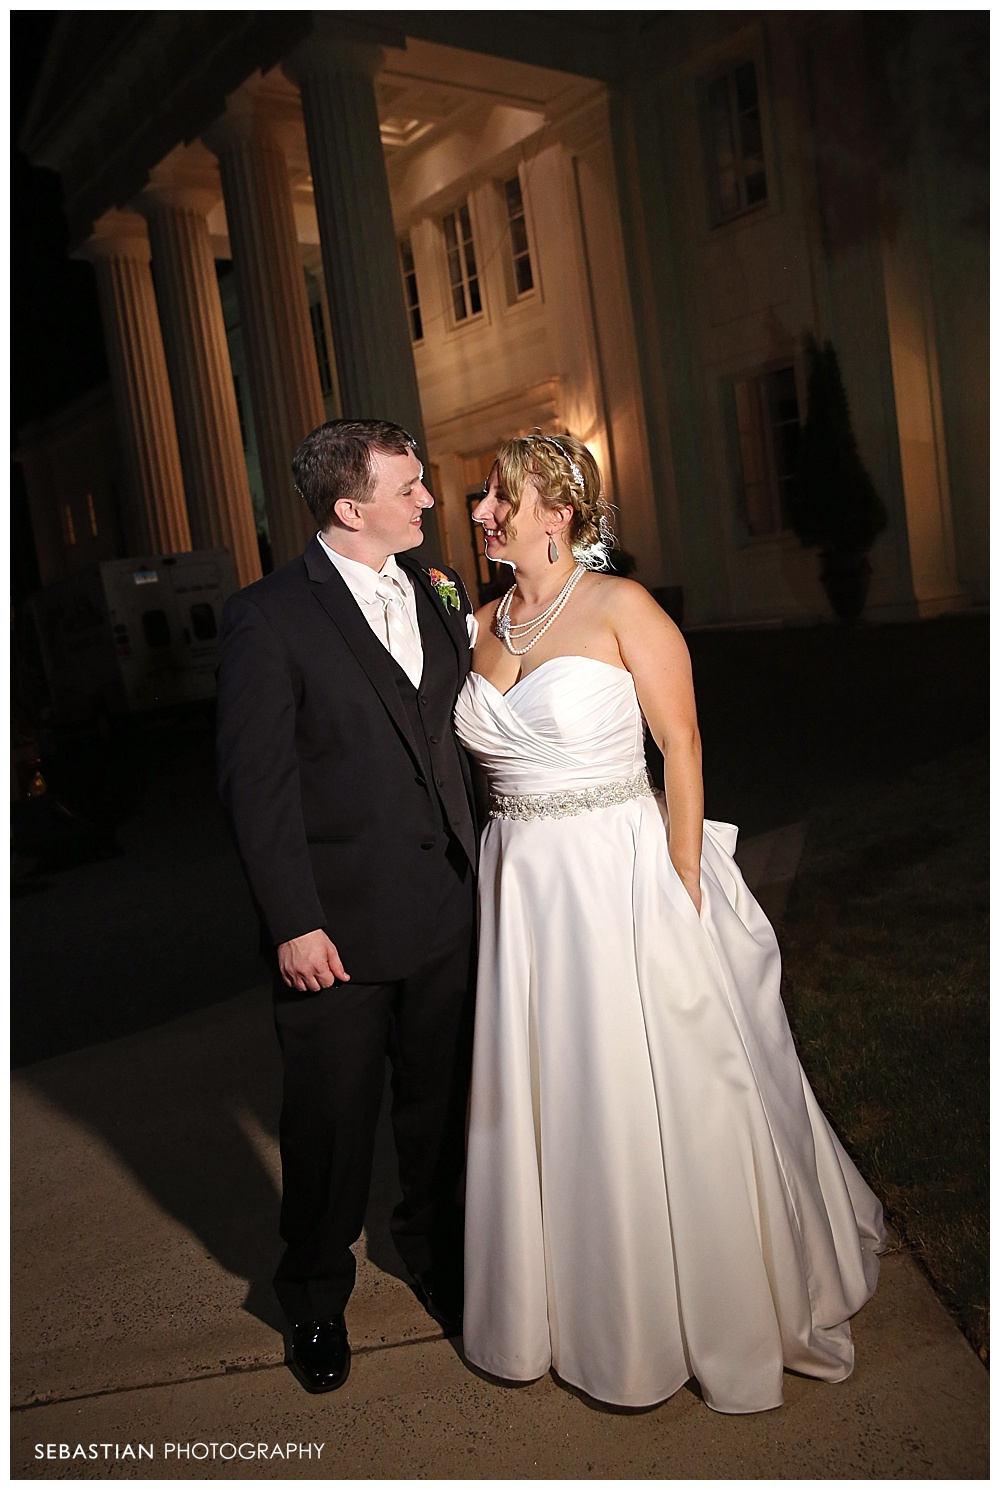 Sebastian_Photography_Wadsworth_Mansion_Wedding_Pictures_CT_64.jpg